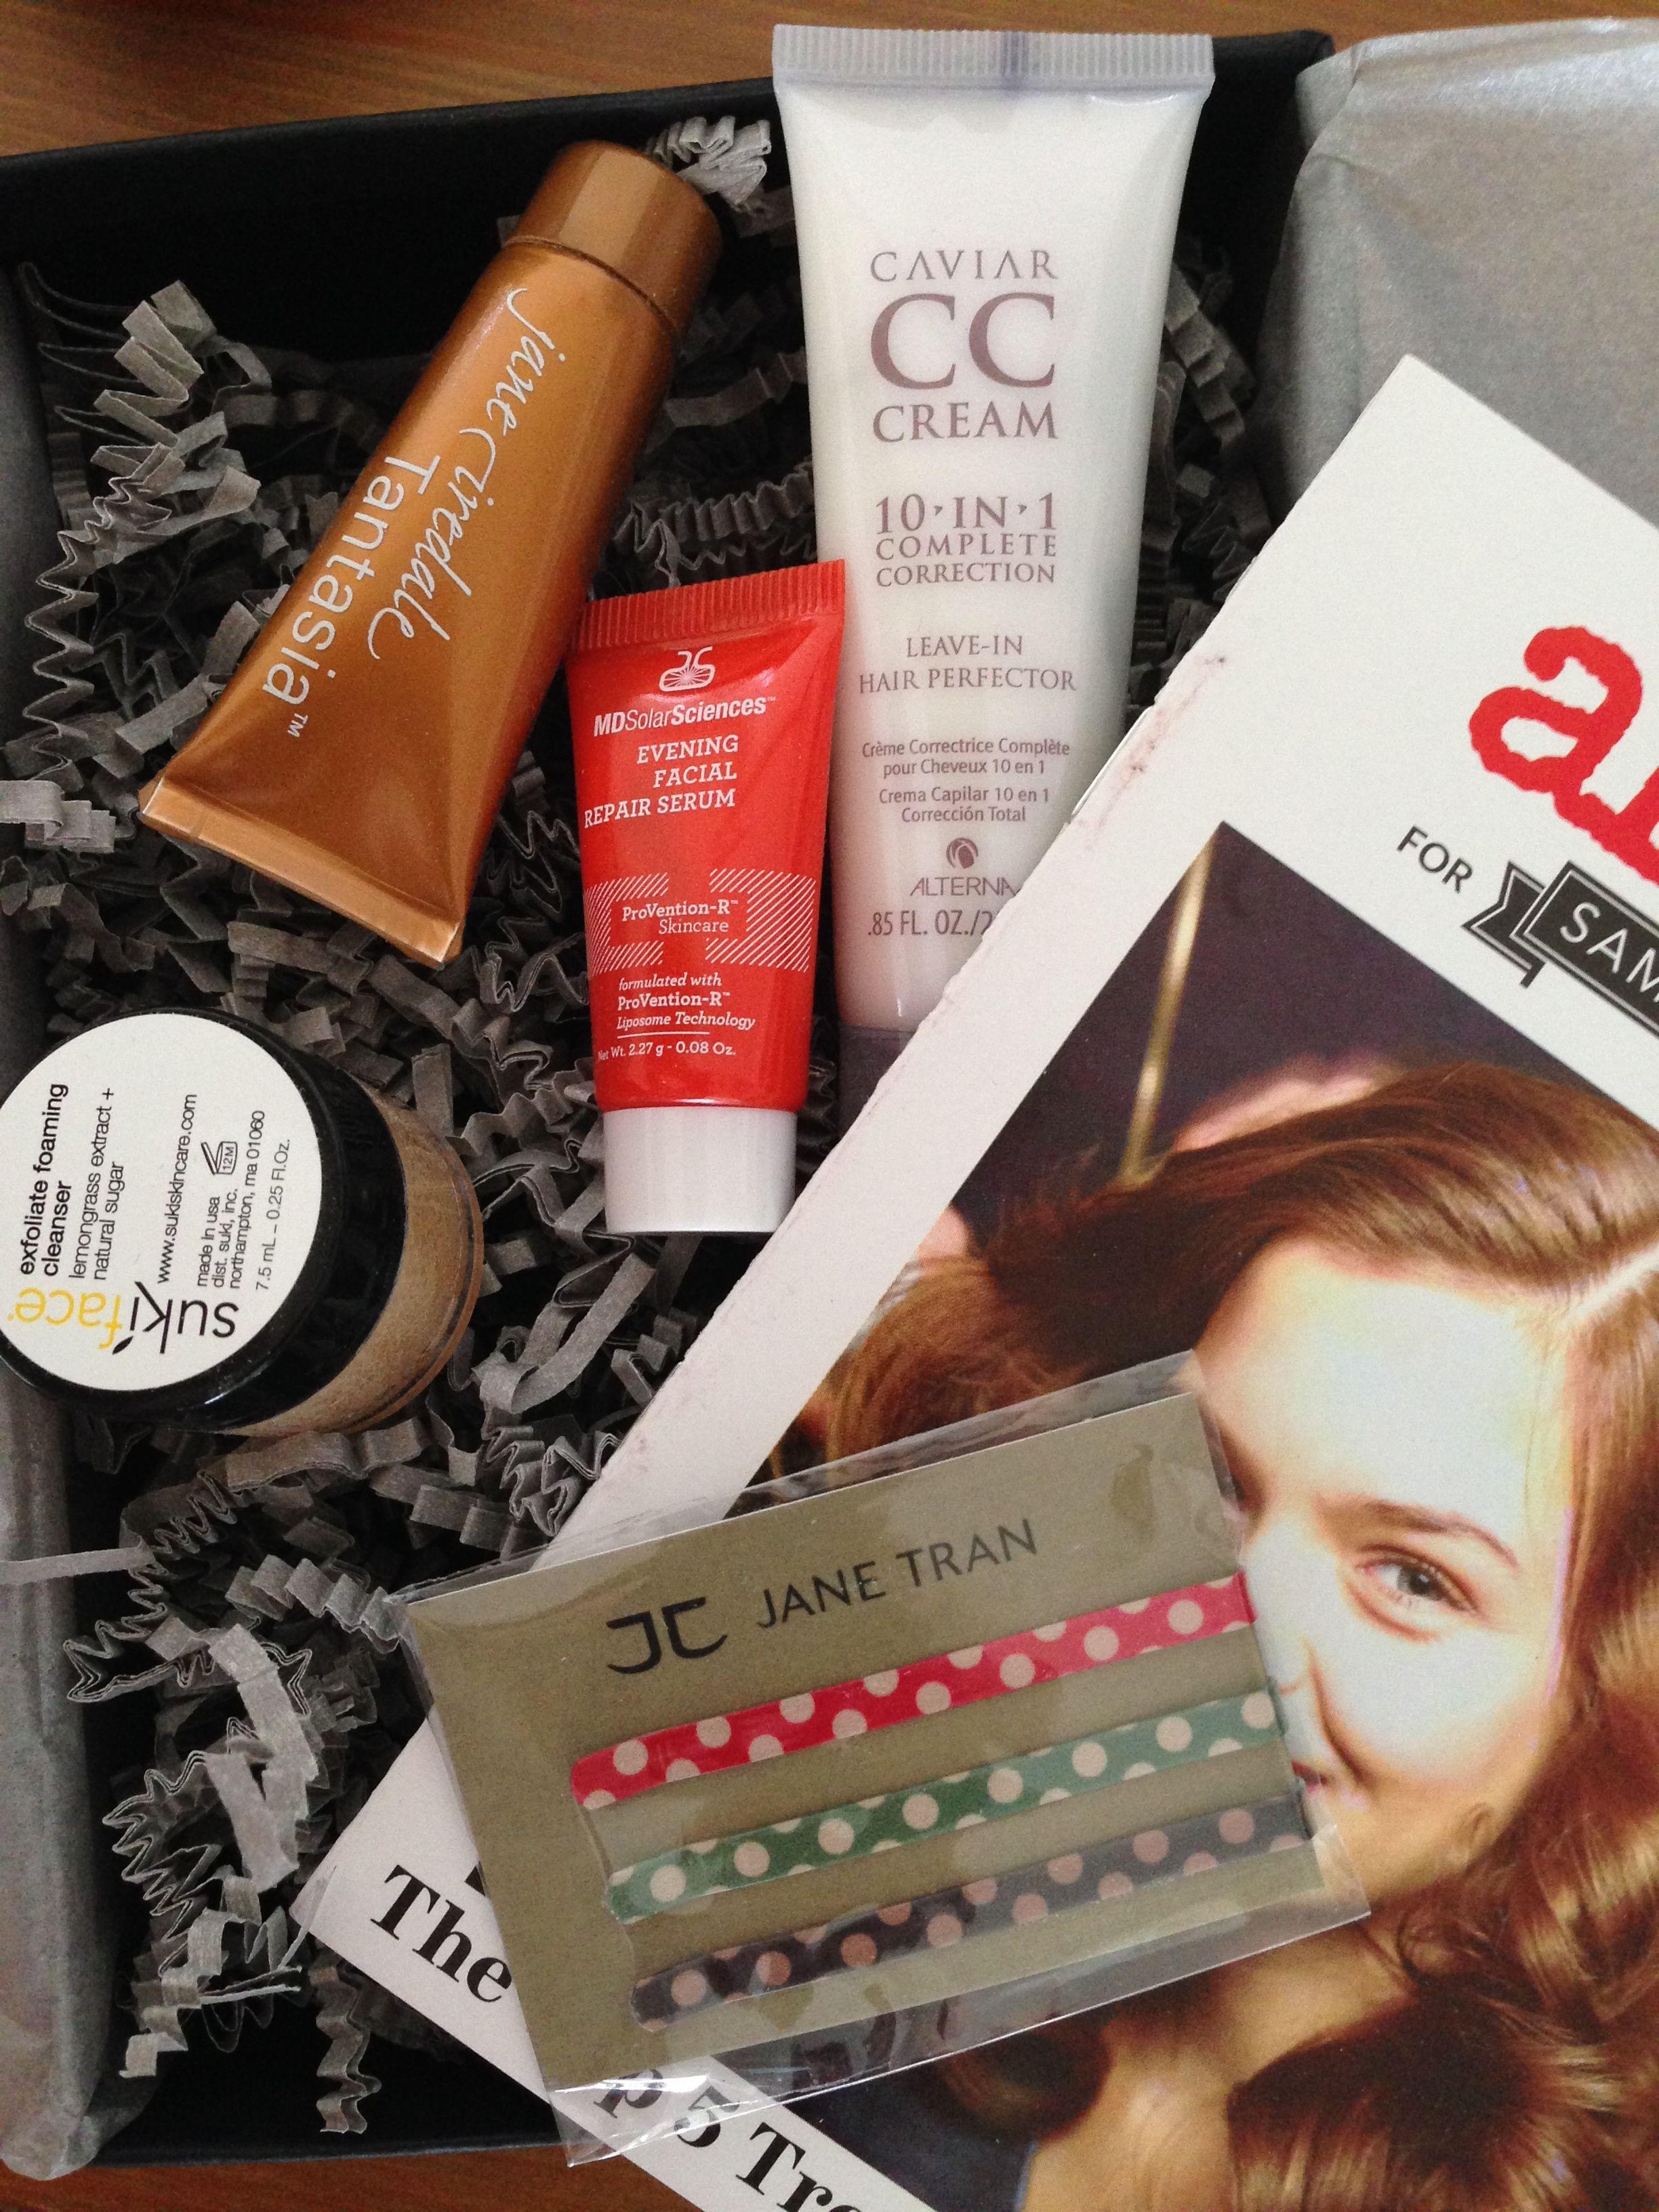 Feb 2014 Beauty Bar. Was impressed mostly by the Suki exfoliating scrub....CC cream for hair, really?!